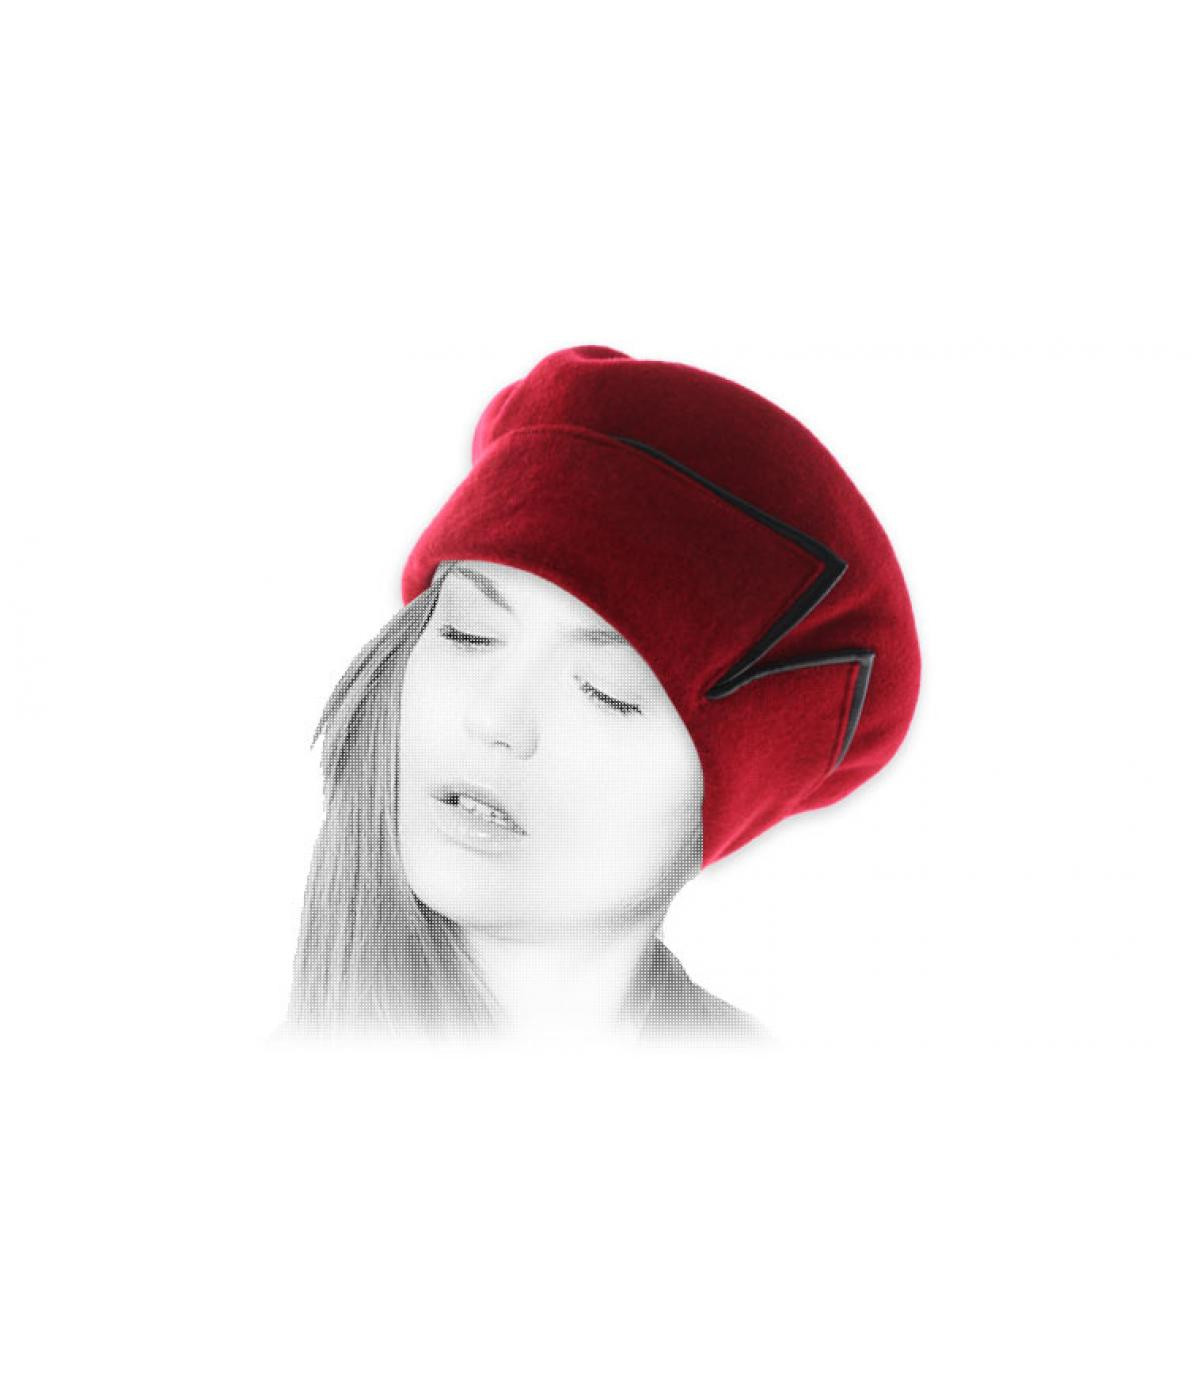 boina roja brazalete de cuero negro